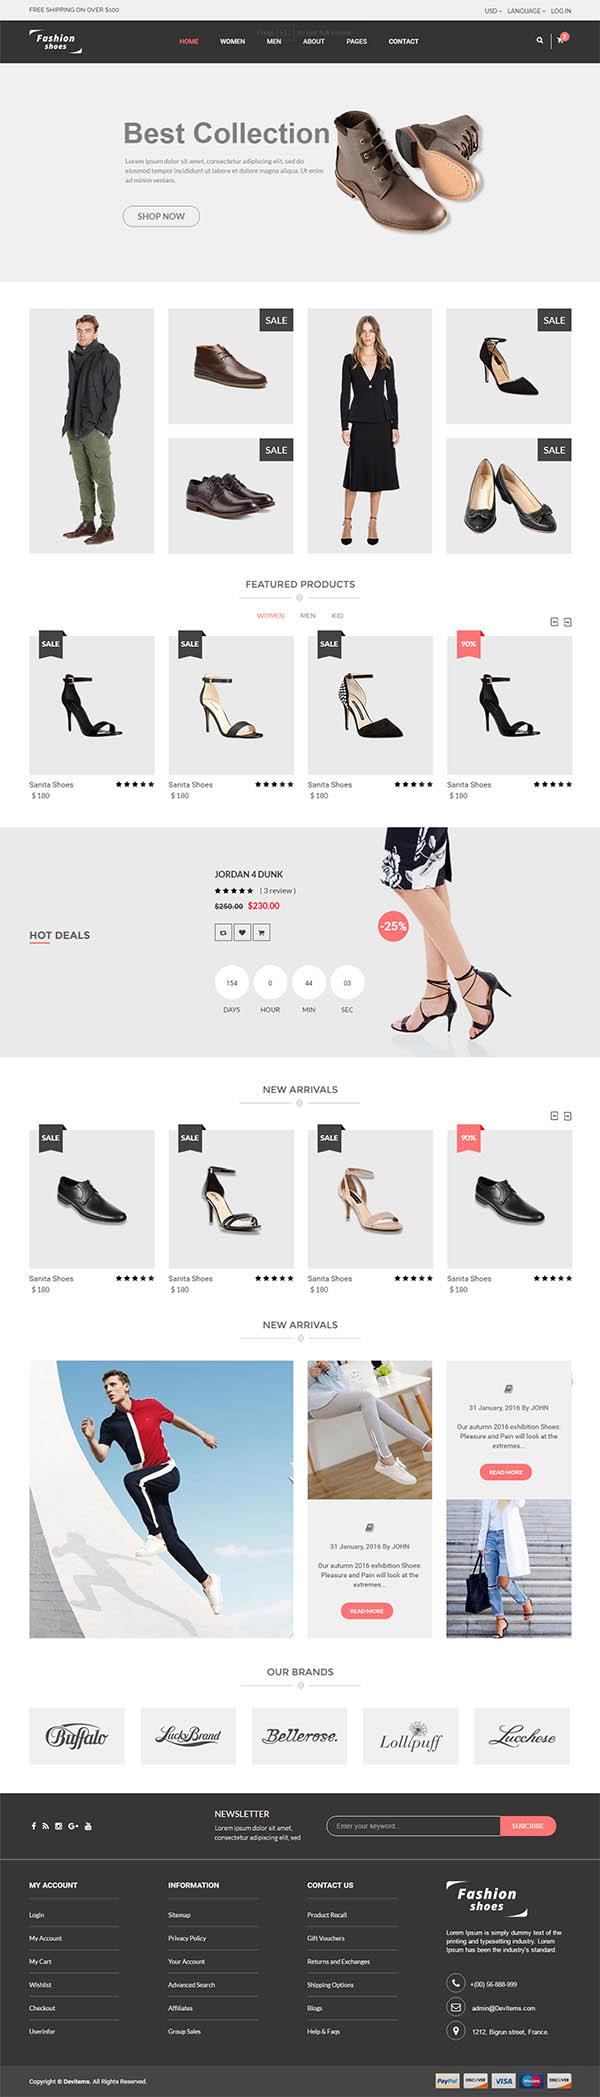 Fashion Shoes - eCommerce Shoe Template